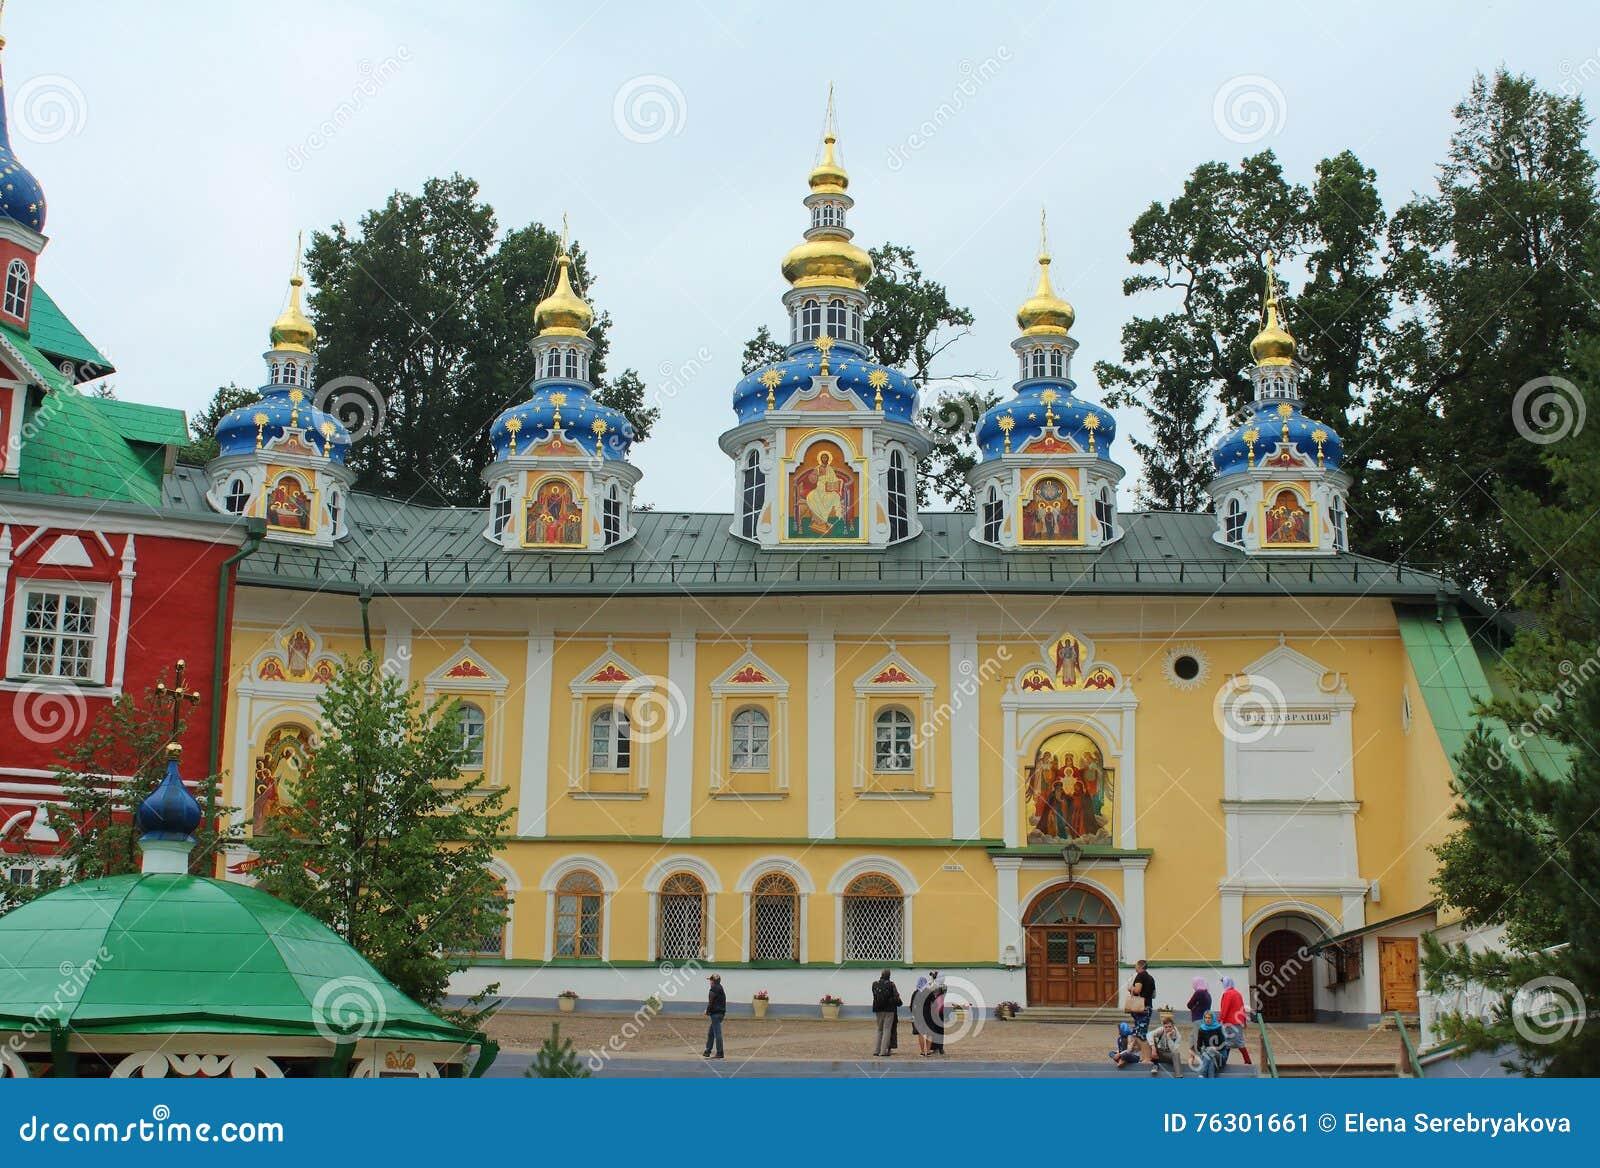 Pskovo-Pechersky Monastery: how to get there 41